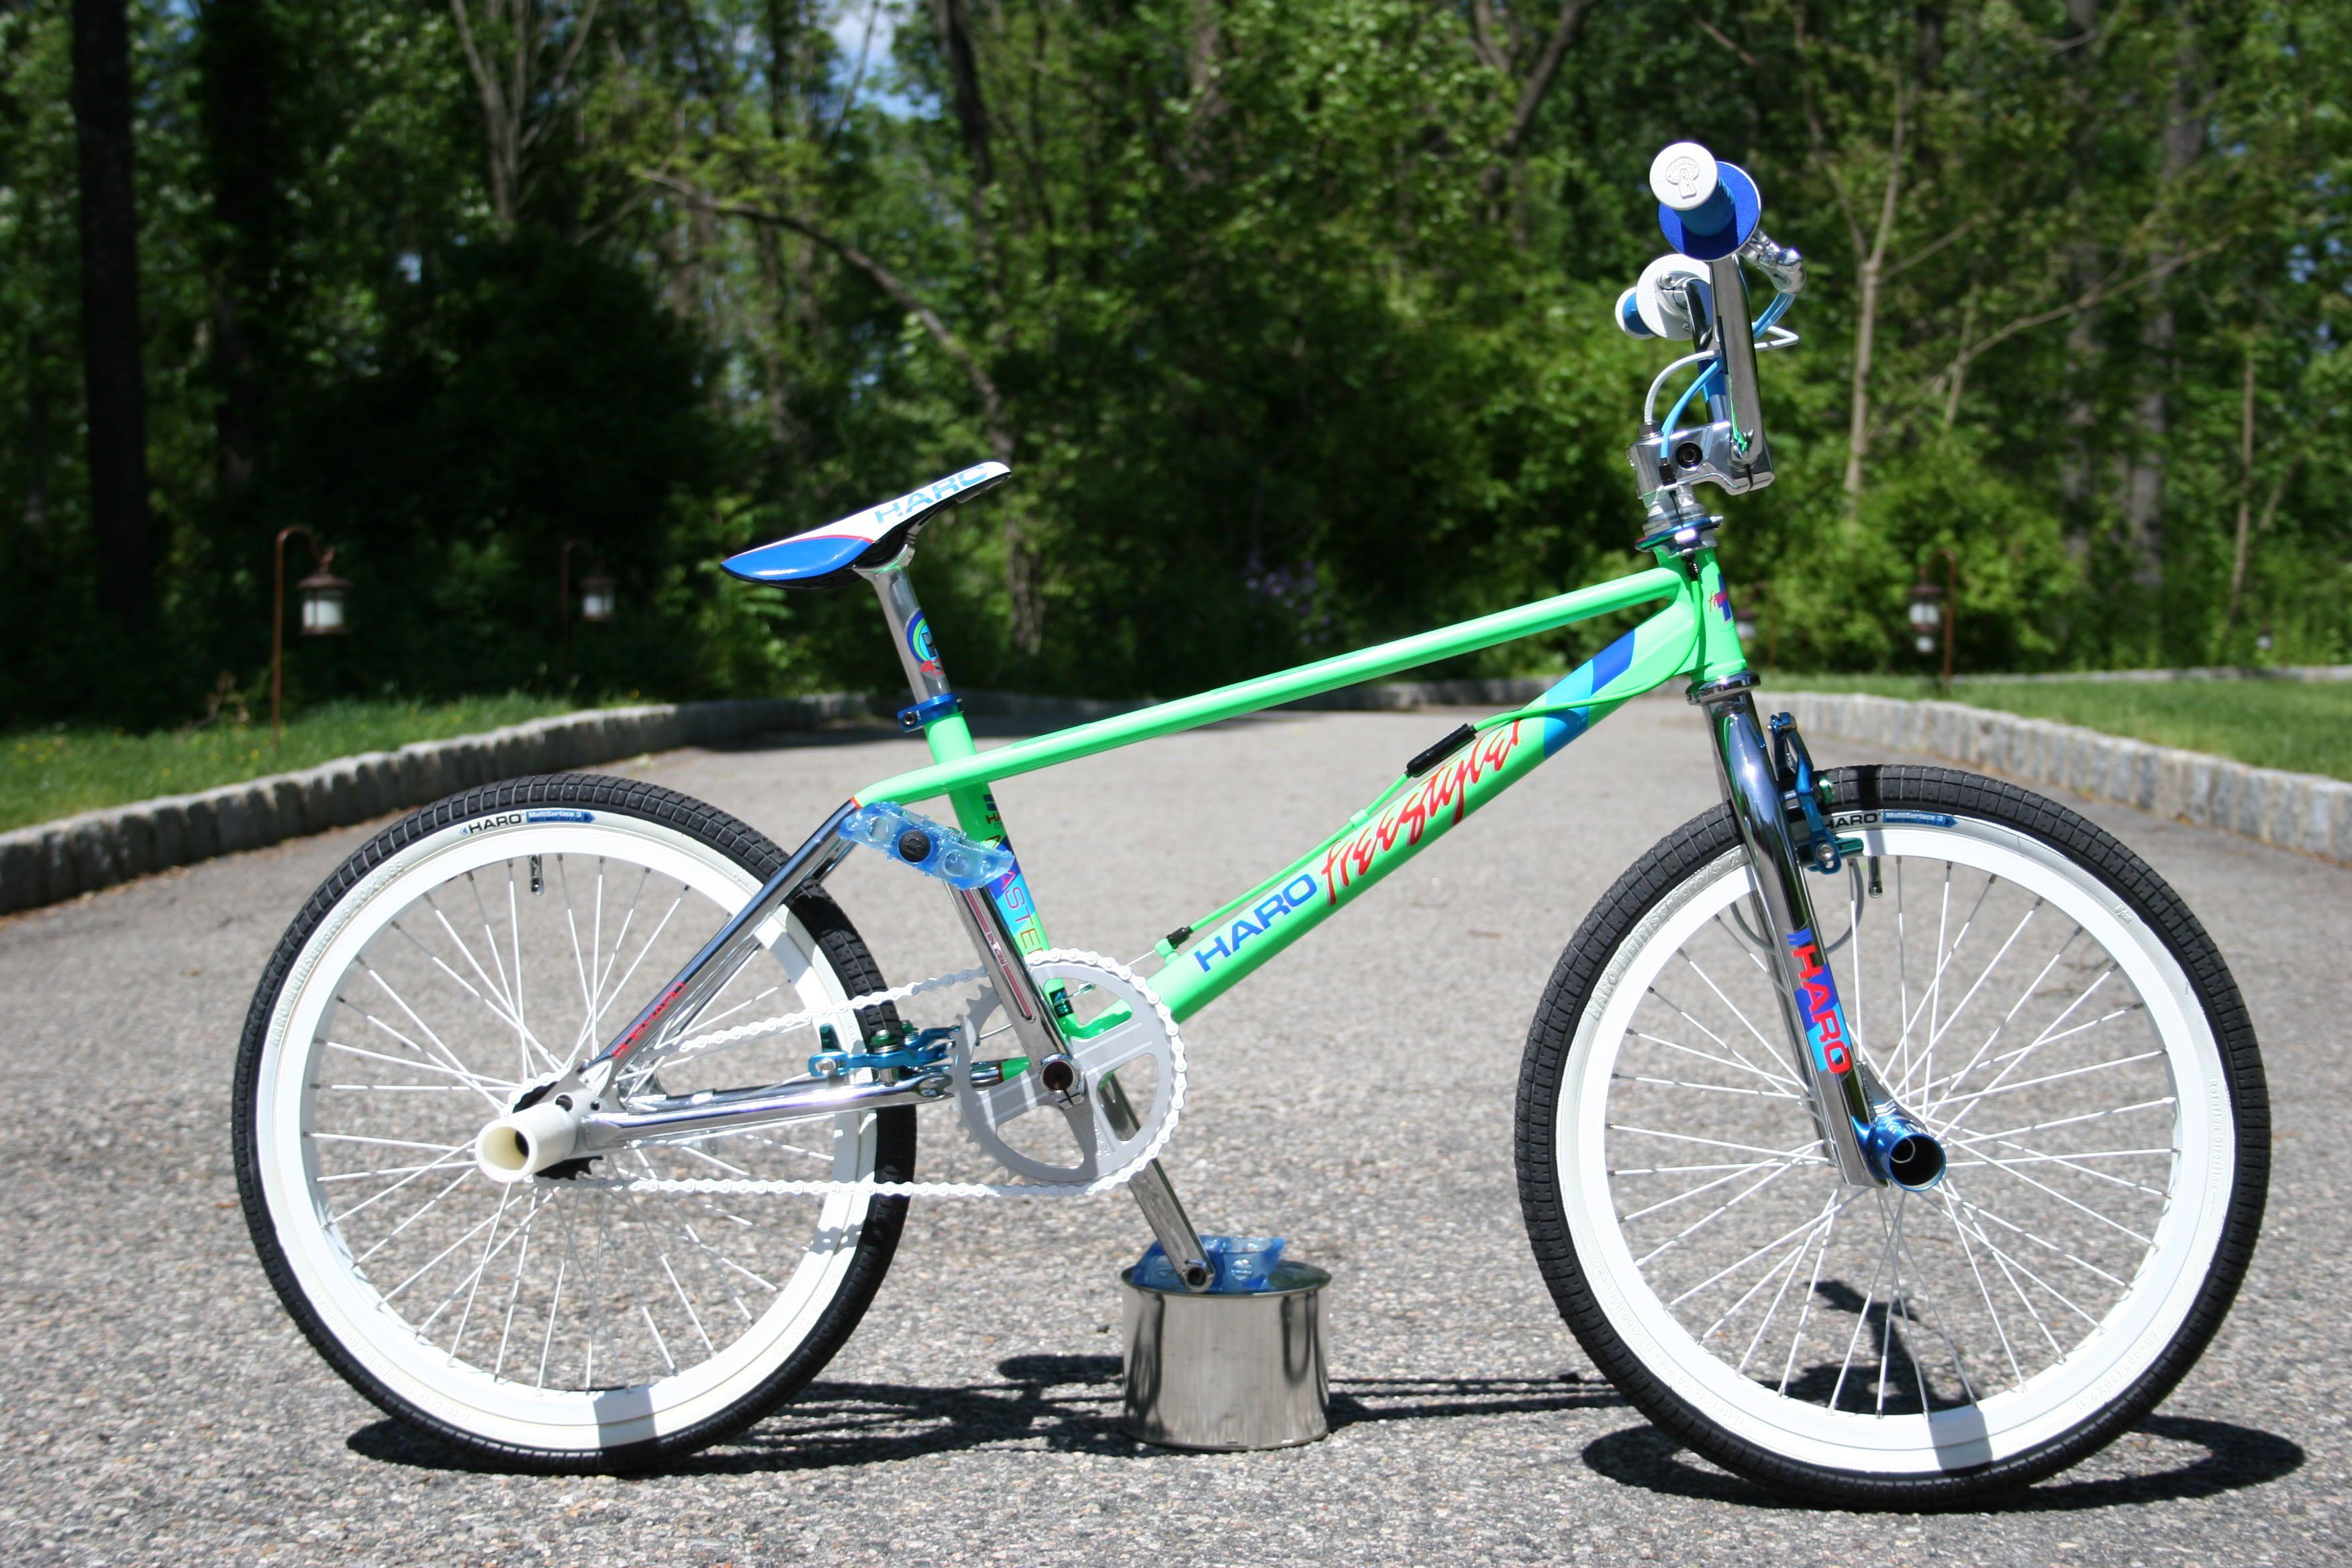 BMX BICYCLE BAR STEM NECK RAD PAD BLUE VINTAGE NOS